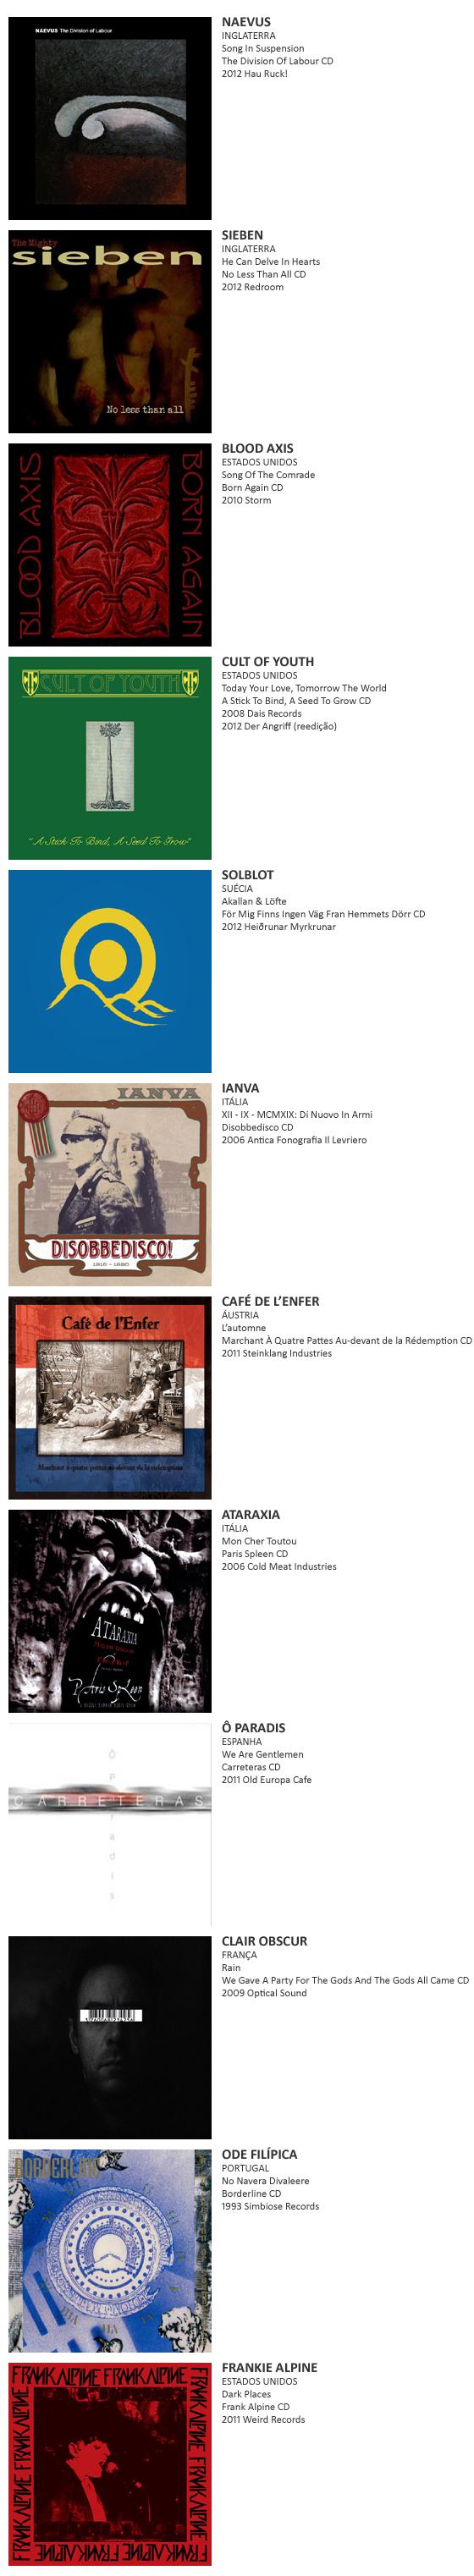 Naevus, Sieben, Blood Axis, Solblot, Cult Of Youth, Café de L'enfer, Ianva, Ataraxia, Ô Paradis, Clair Obscur, Ode Filípica, Frankie Alpine